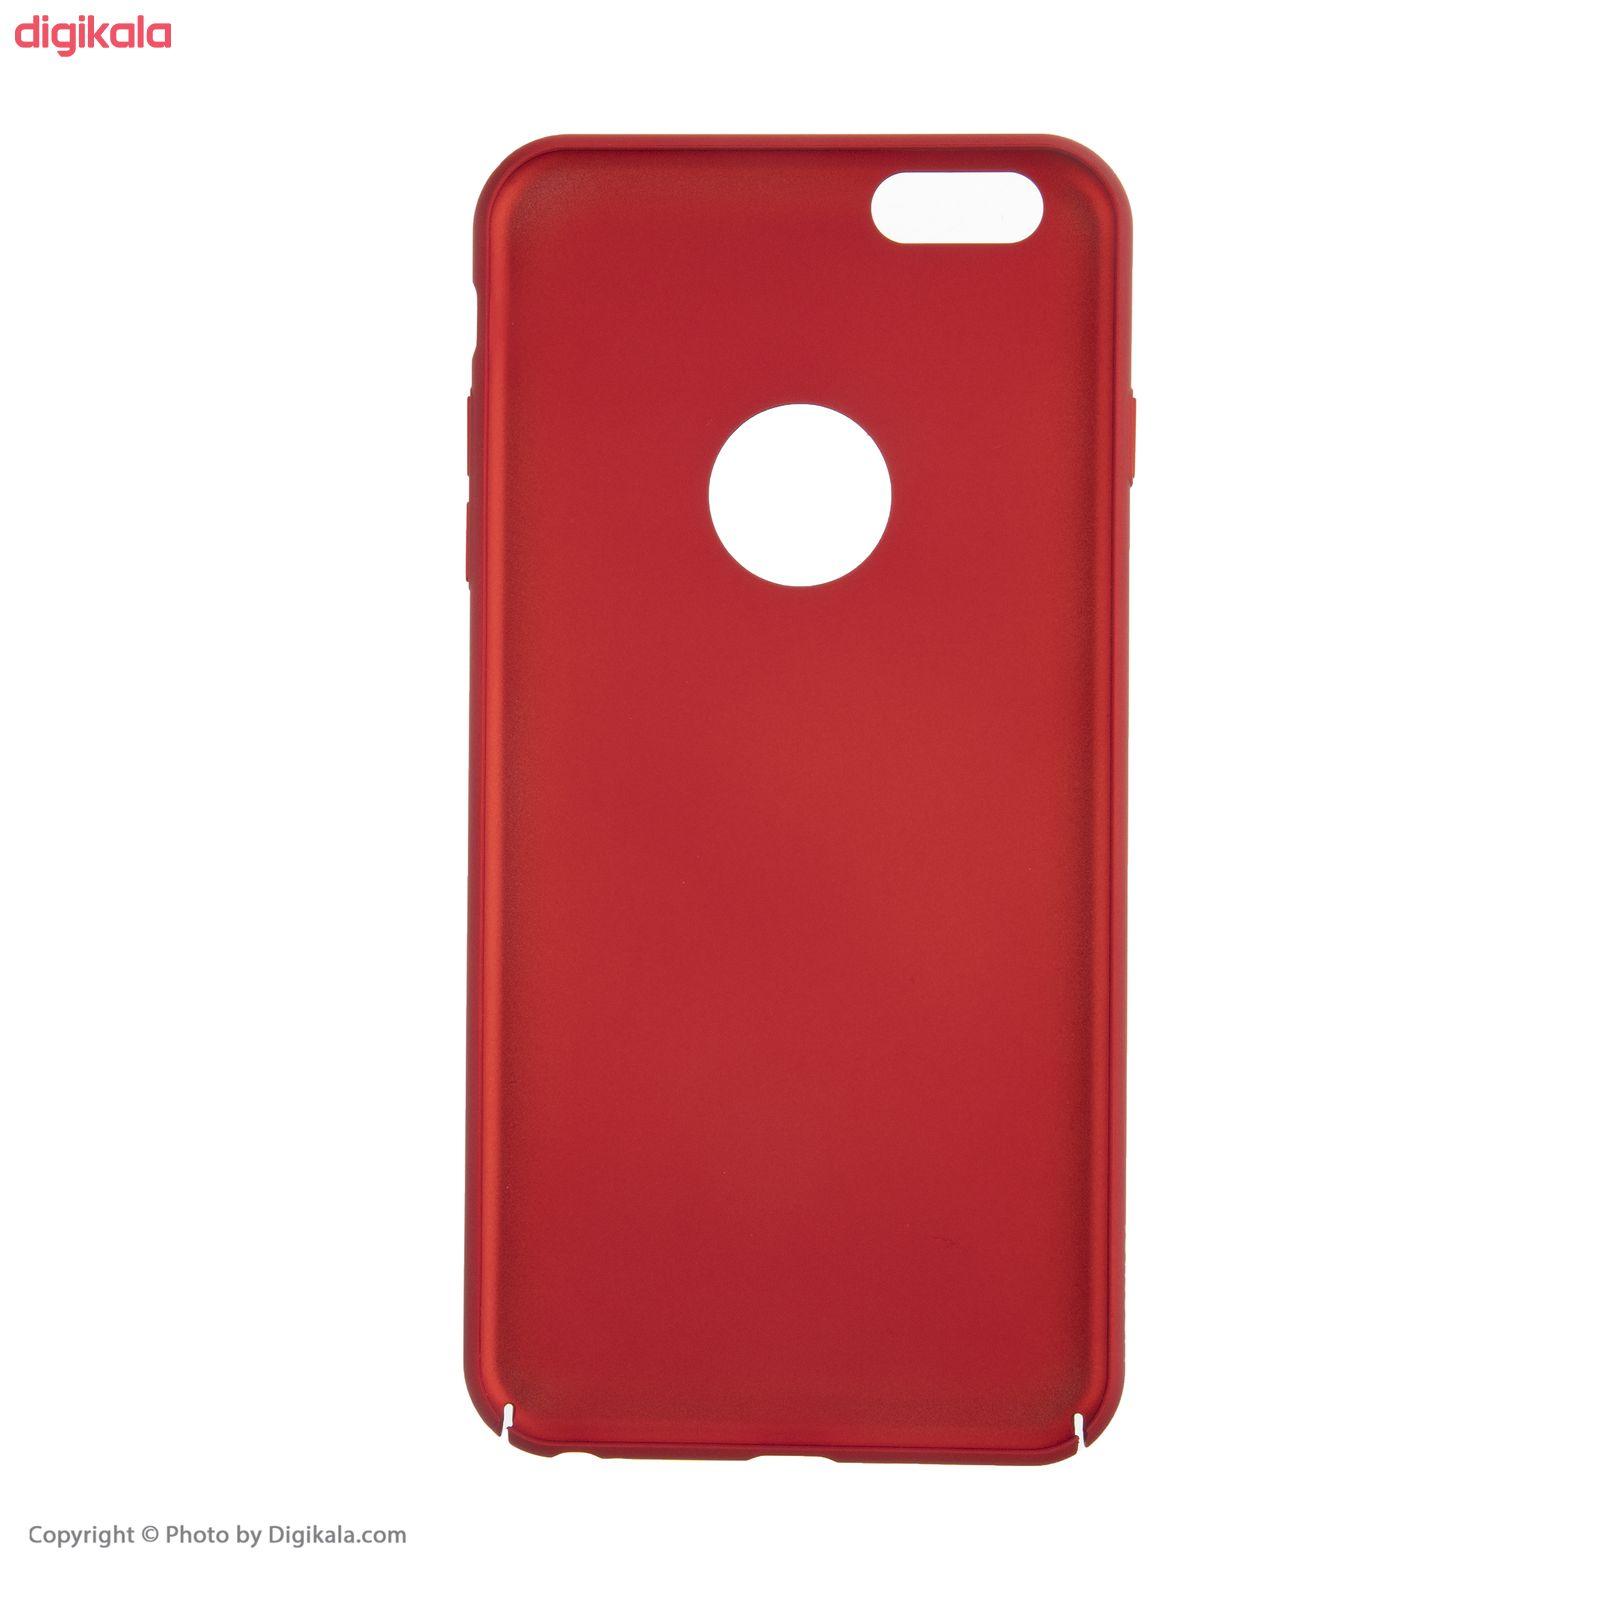 کاور جوی روم مدل JR-BP157 مناسب برای گوشی موبایل اپل iPhone 6 plus/6s plus  main 1 4